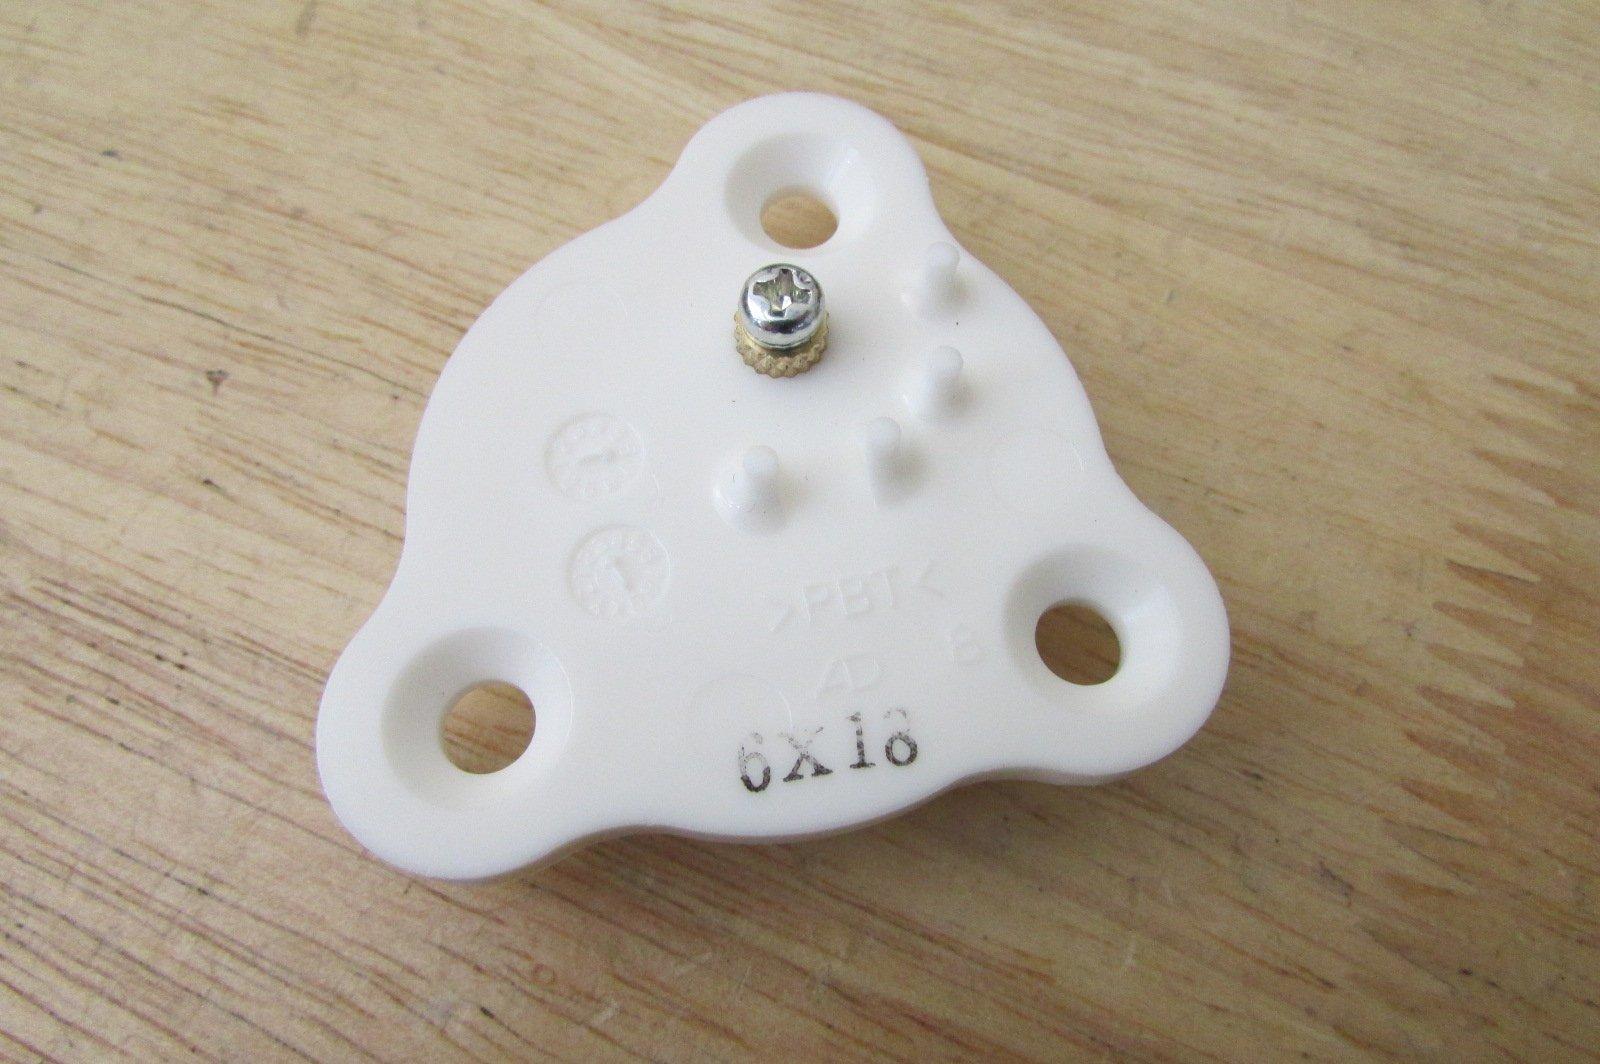 Yamaha 1L9-82540-00-00 NEUTRAL SWITCH ASY; 1L9825400000 , 1L9-82540-00-00, 371-82540-00-00, 278-82540-01-00,